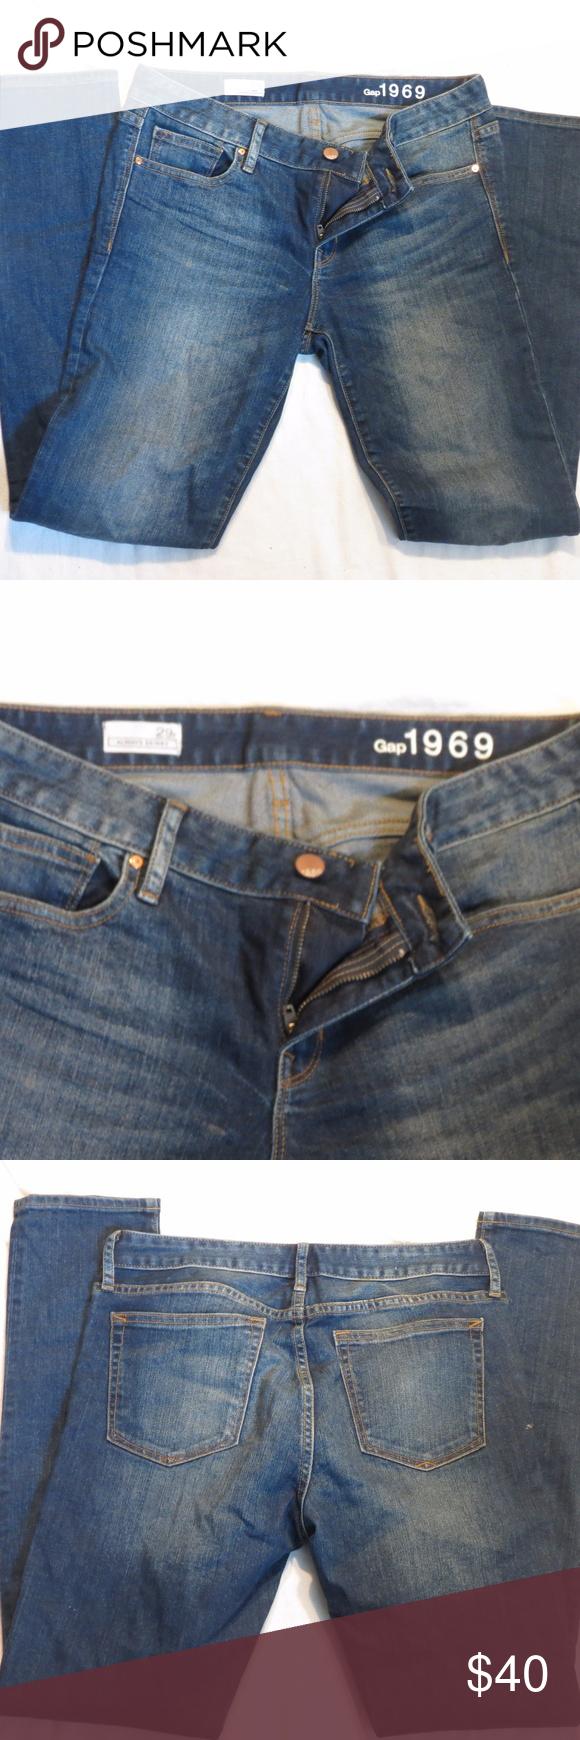 Mid rise true skinny jeans SIZE 29R Premium, medium stretch 1969 denim. Medium indigo wash. Zip fly, button closure. Five-pocket styling GAP Jeans